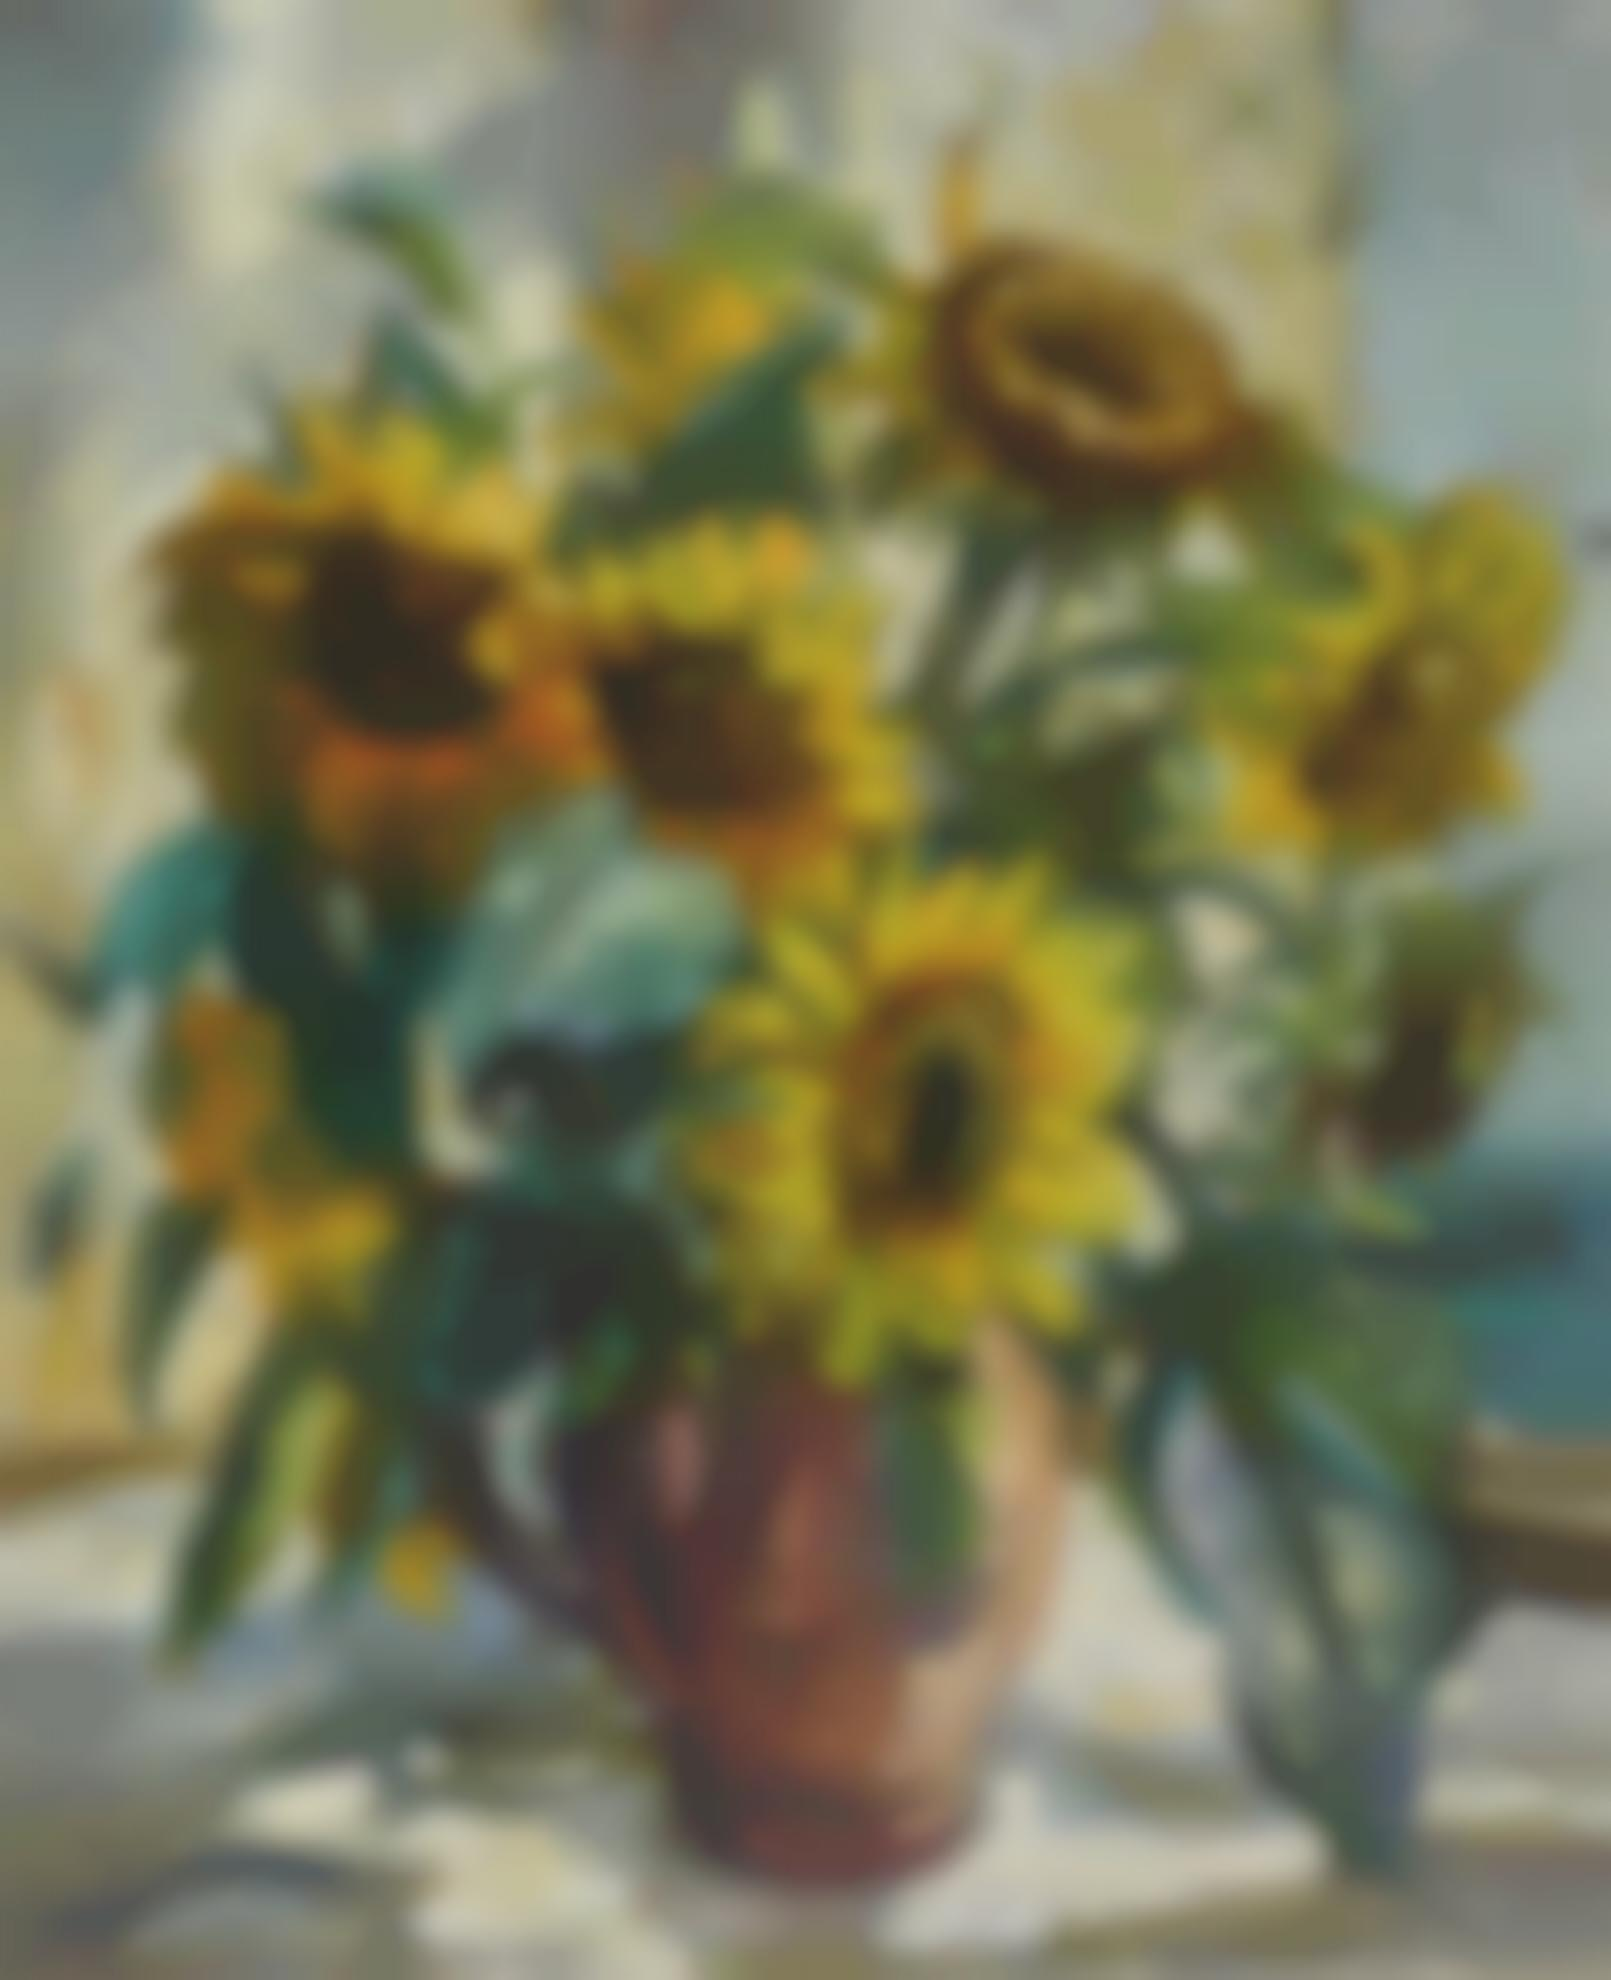 Dorothea Sharp R.O.I. V.P.S.W.A. - Sunflowers-